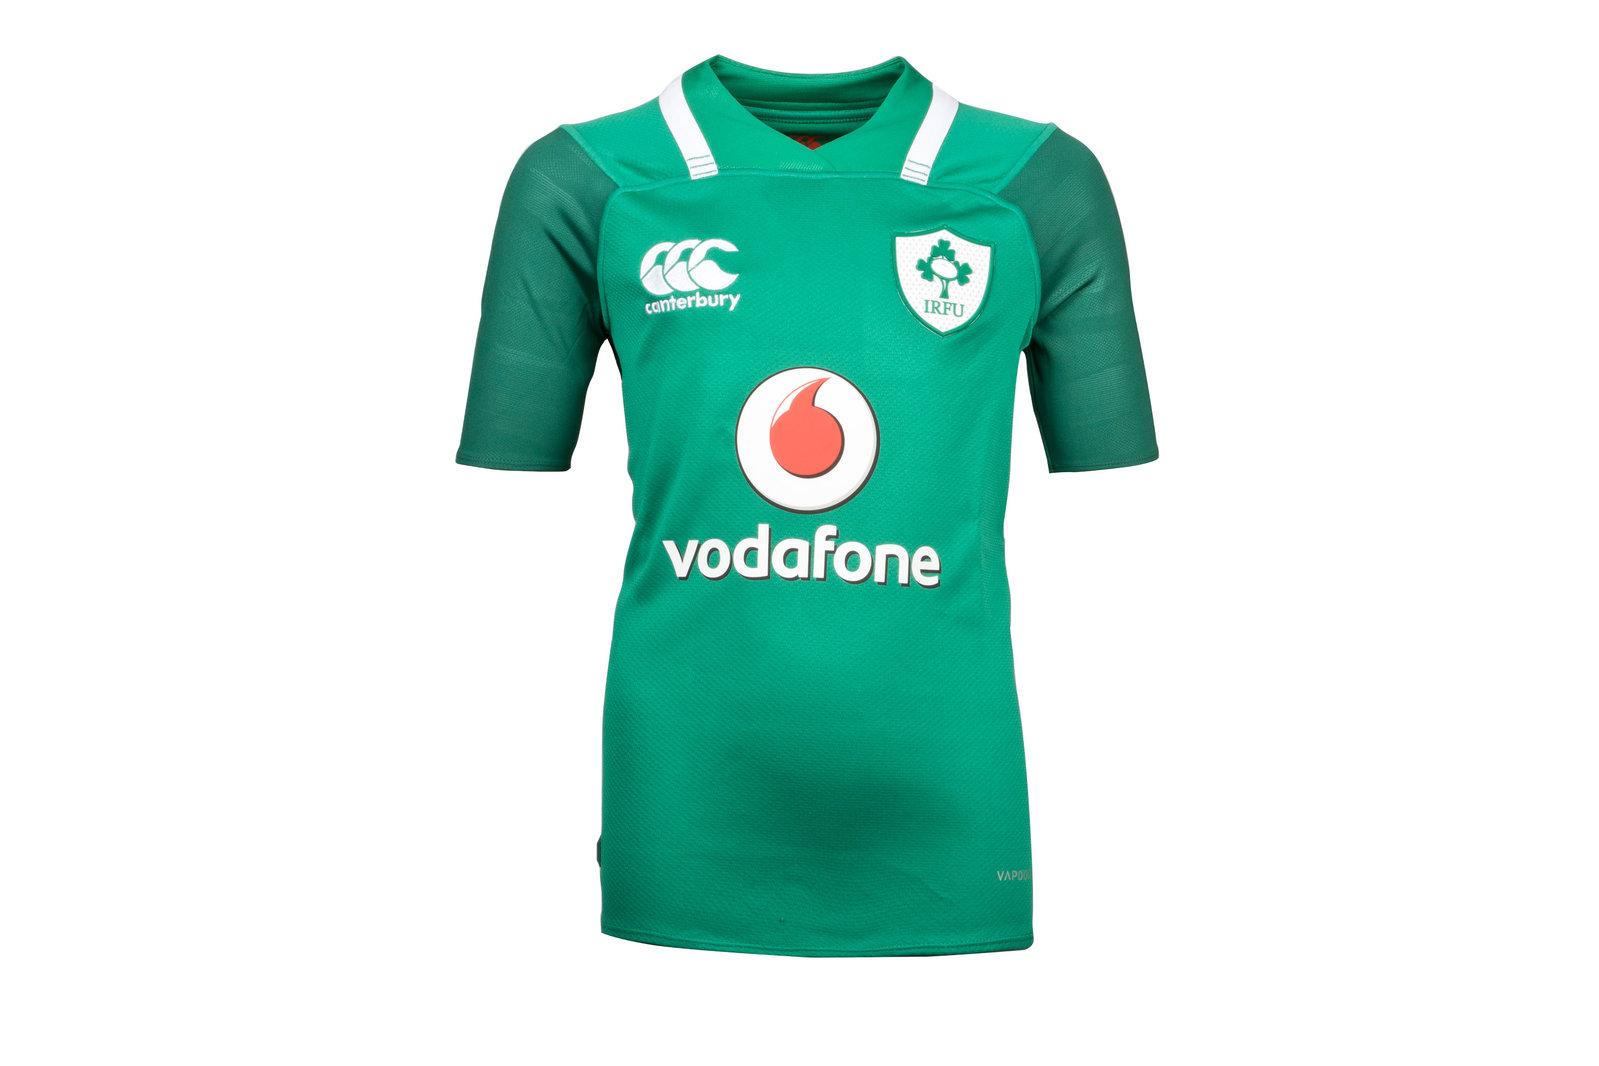 a0e21baef73 Canterbury Unisex Ireland IRFU 2017/18 Kids Home Pro S/S Replica Rugby Shirt  Top